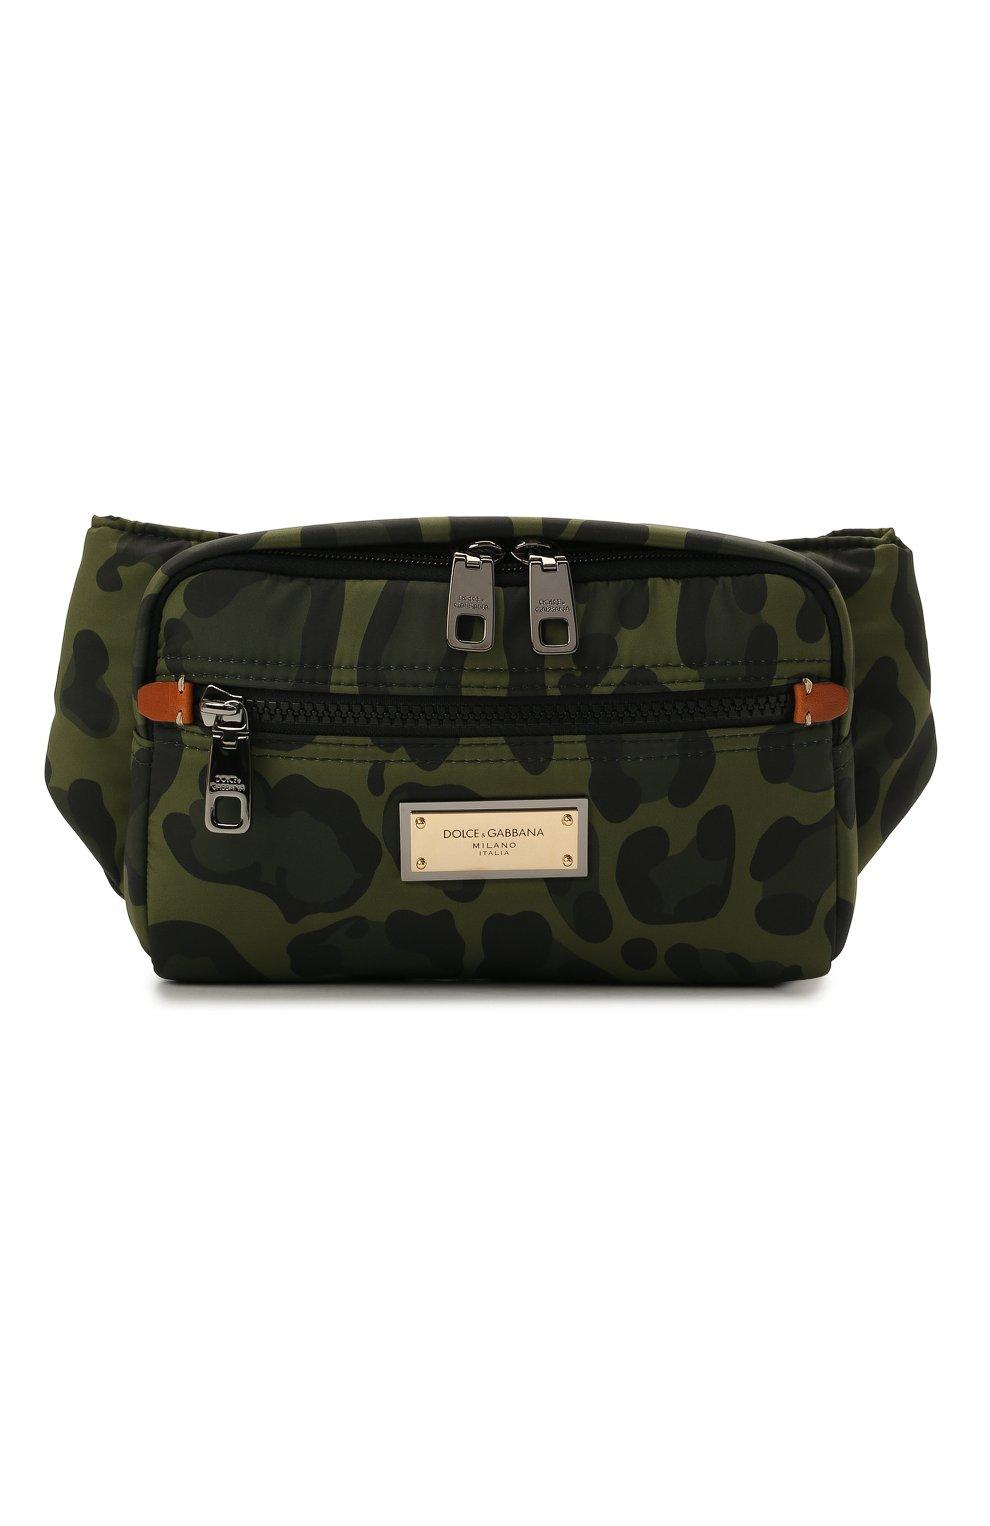 Мужская текстильная поясная сумка nero sicilia dna DOLCE & GABBANA хаки цвета, арт. BM1967/A0885 | Фото 1